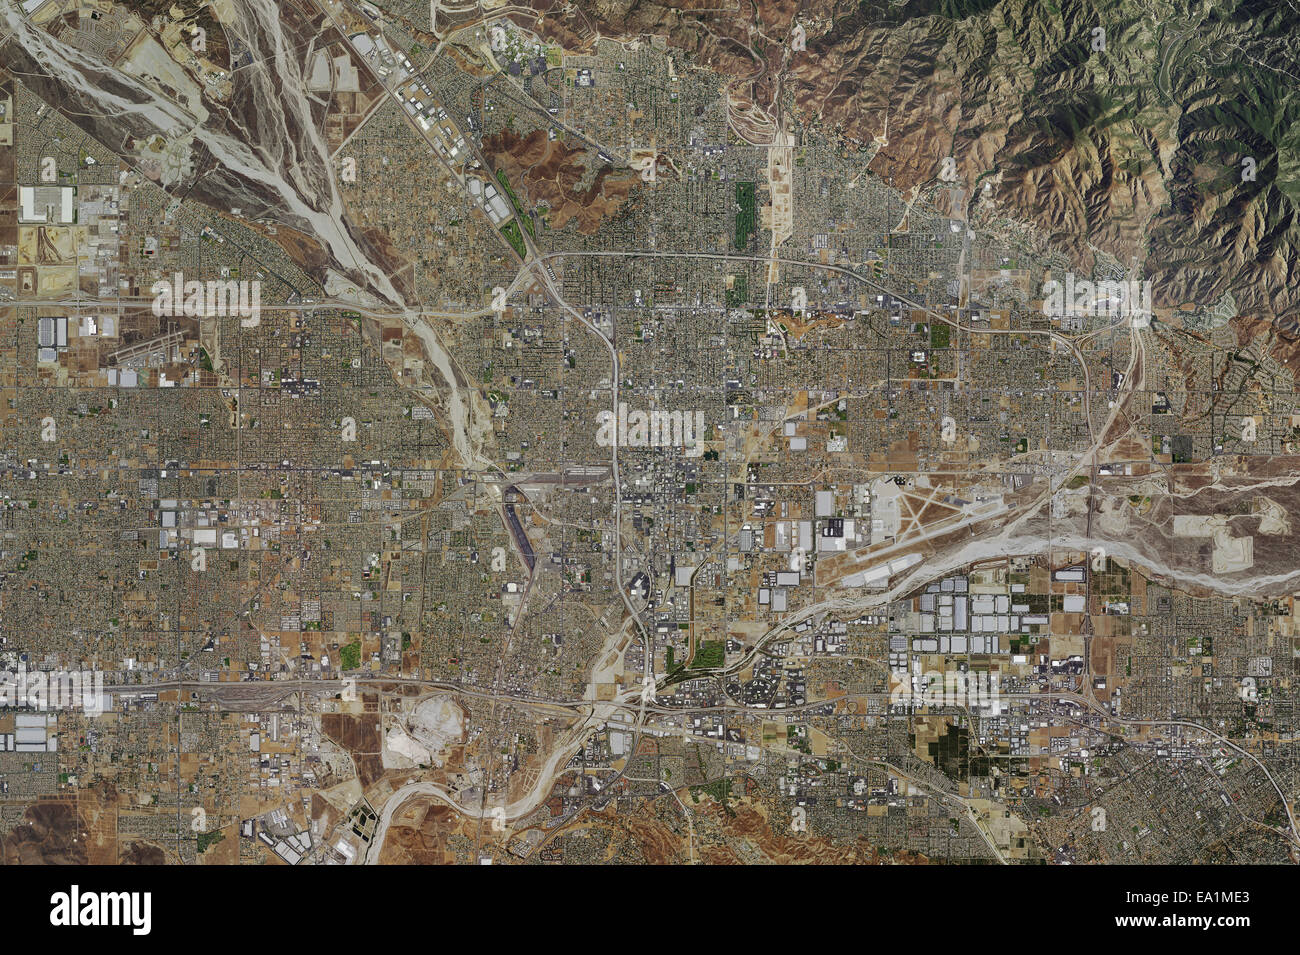 aerial photo map of City of San Bernadino, San Bernadino County, California, 2014 - Stock Image